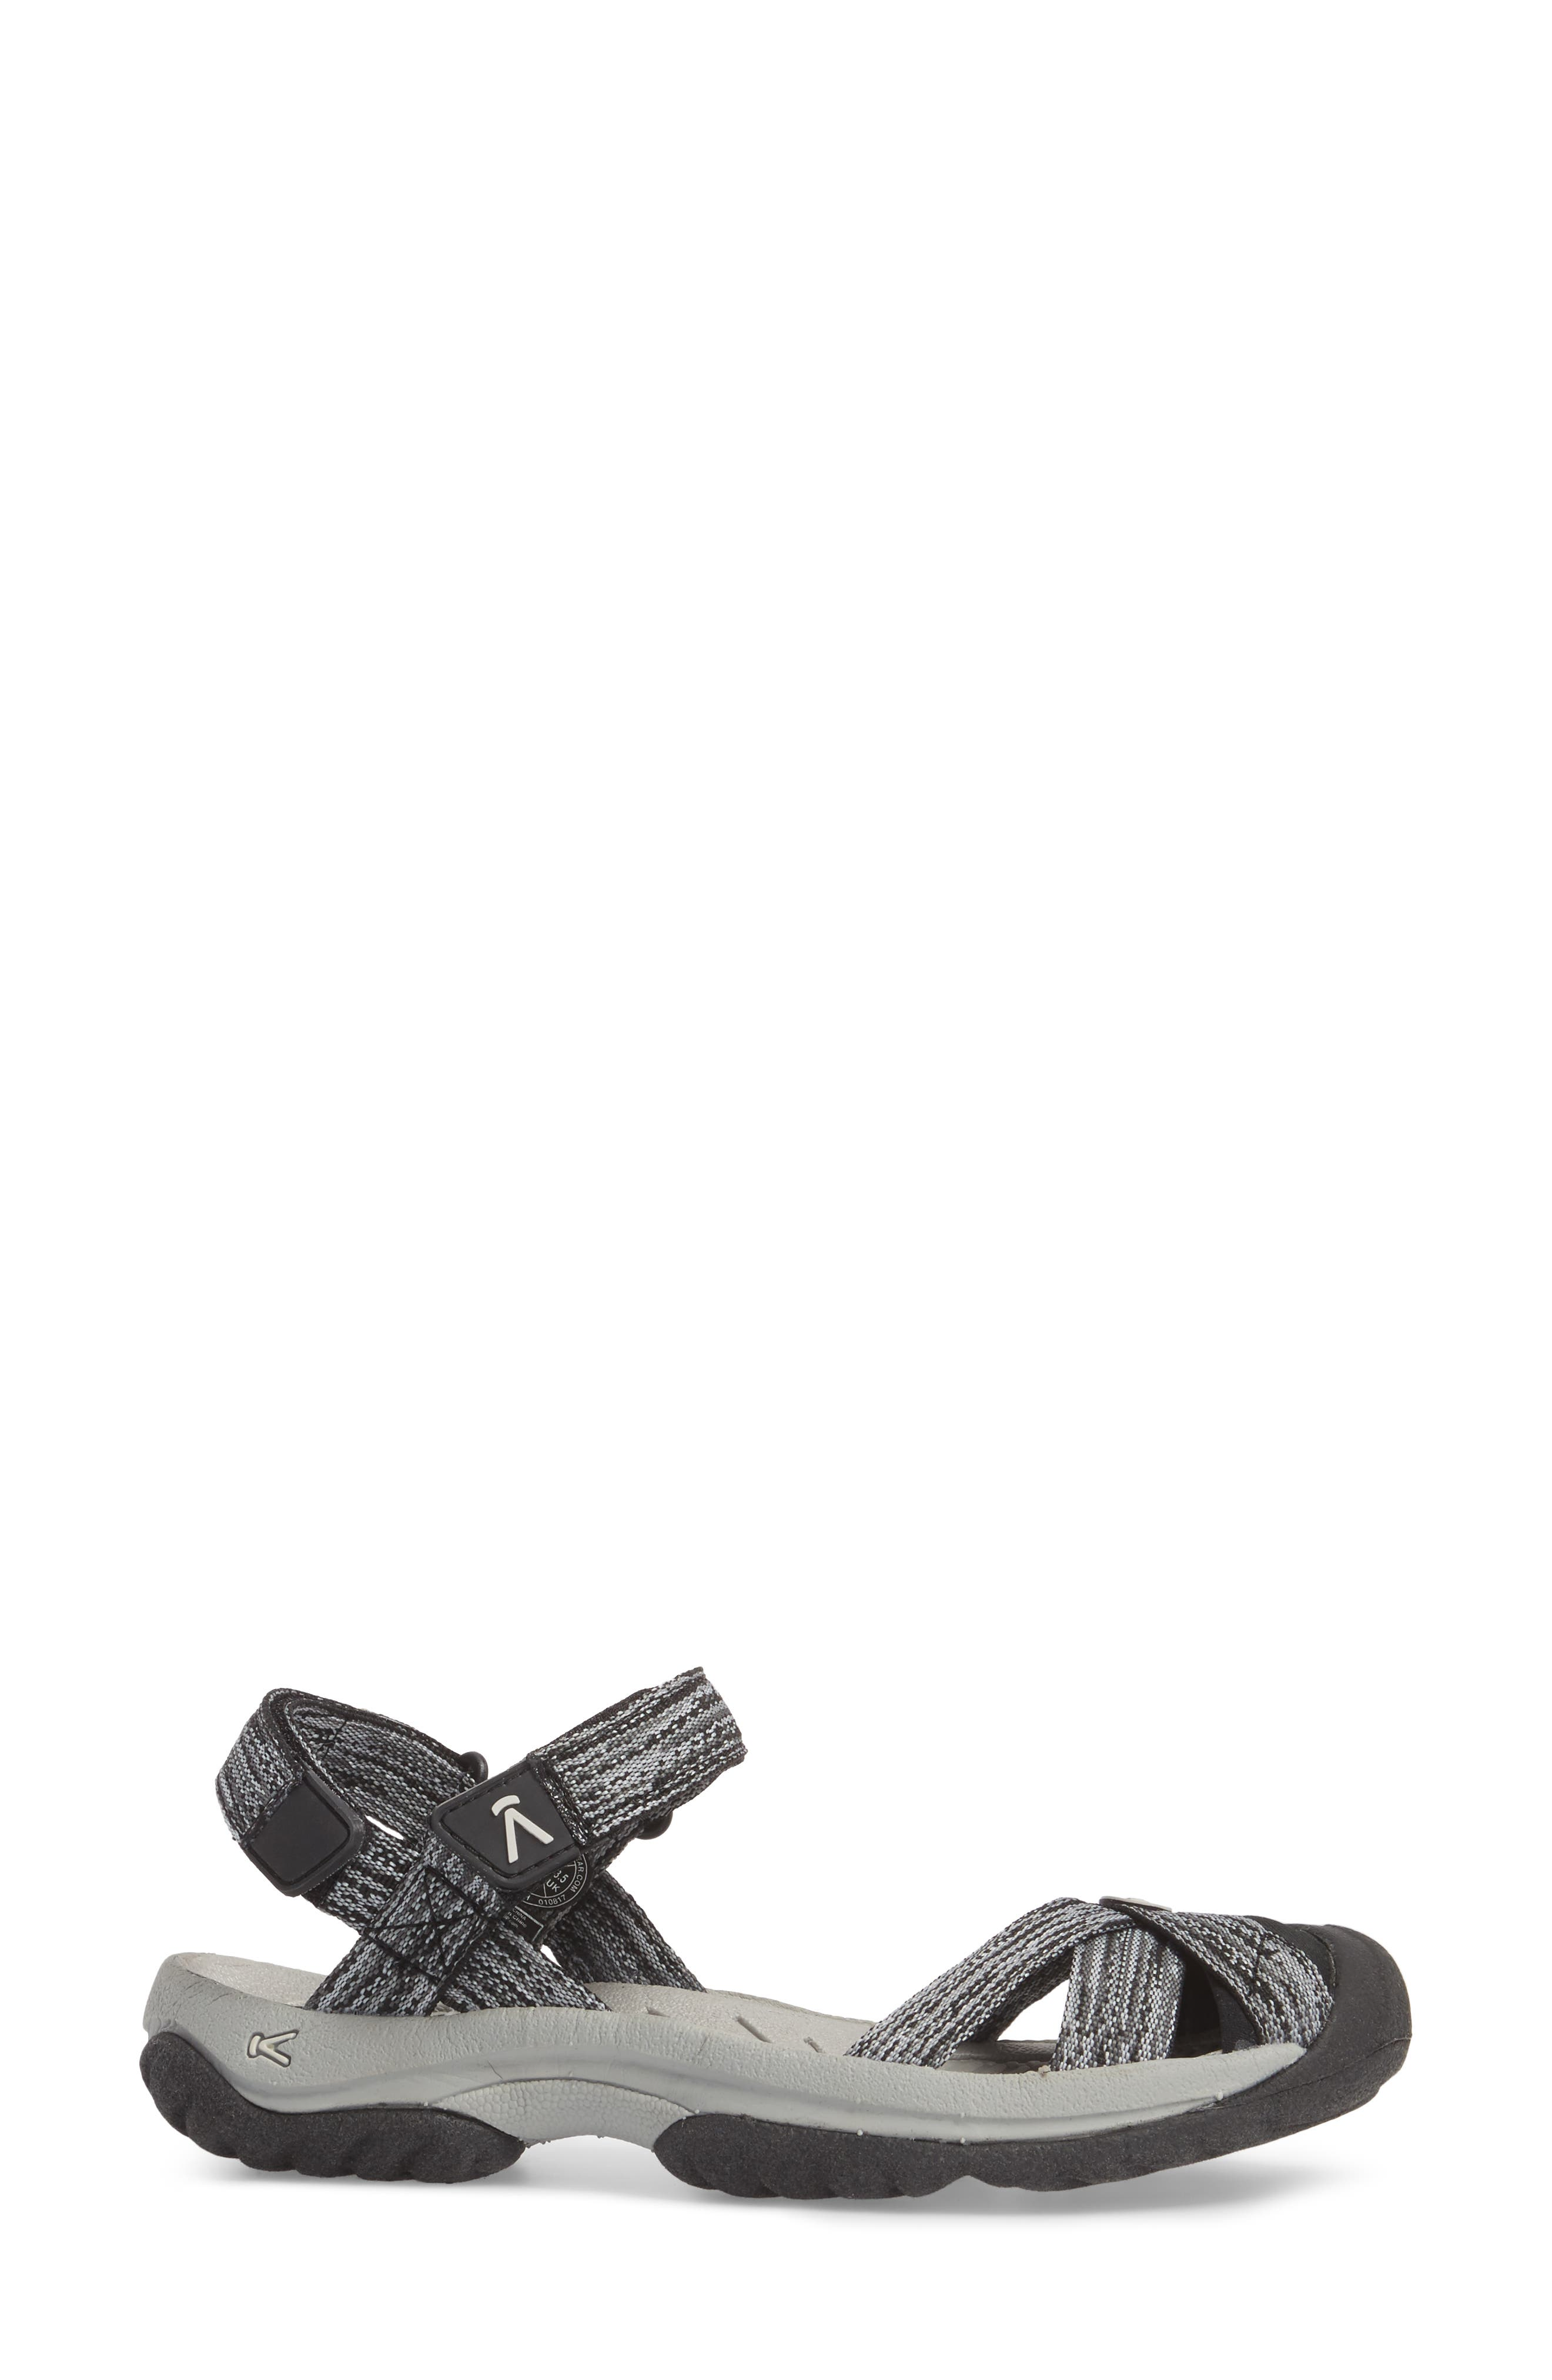 Bali Sandal,                             Alternate thumbnail 3, color,                             NEUTRAL GRAY/ BLACK